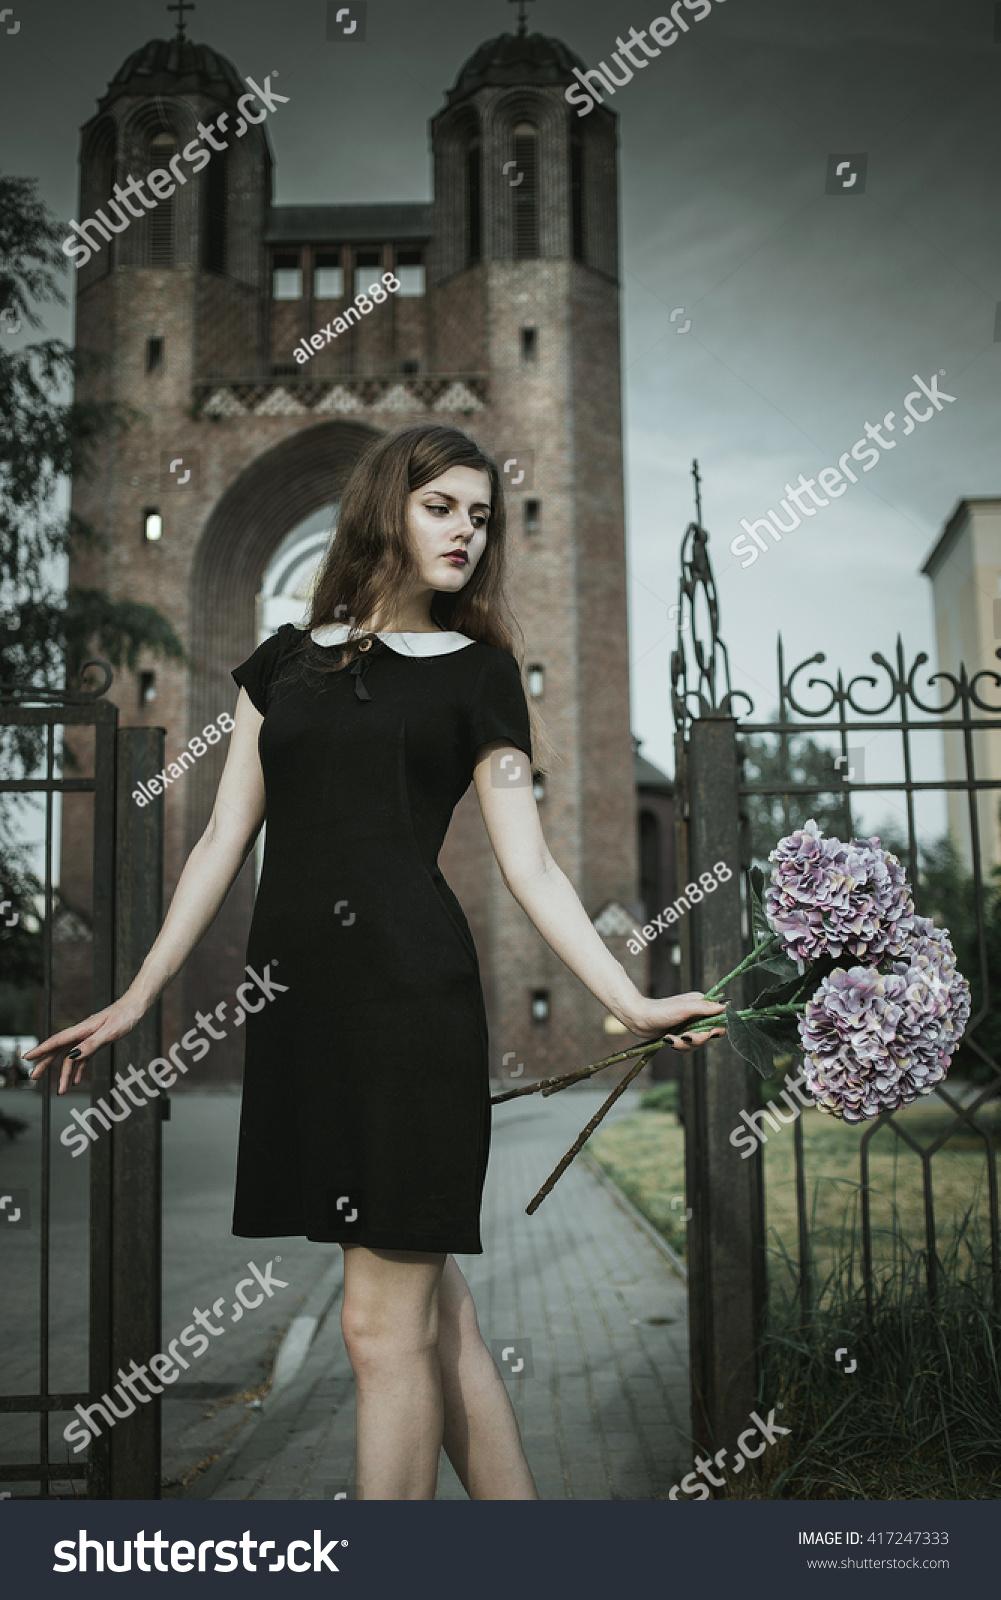 c7994ae19 Cute Goth Girl Wearing Black Dress Stock Photo (Edit Now) 417247333 ...